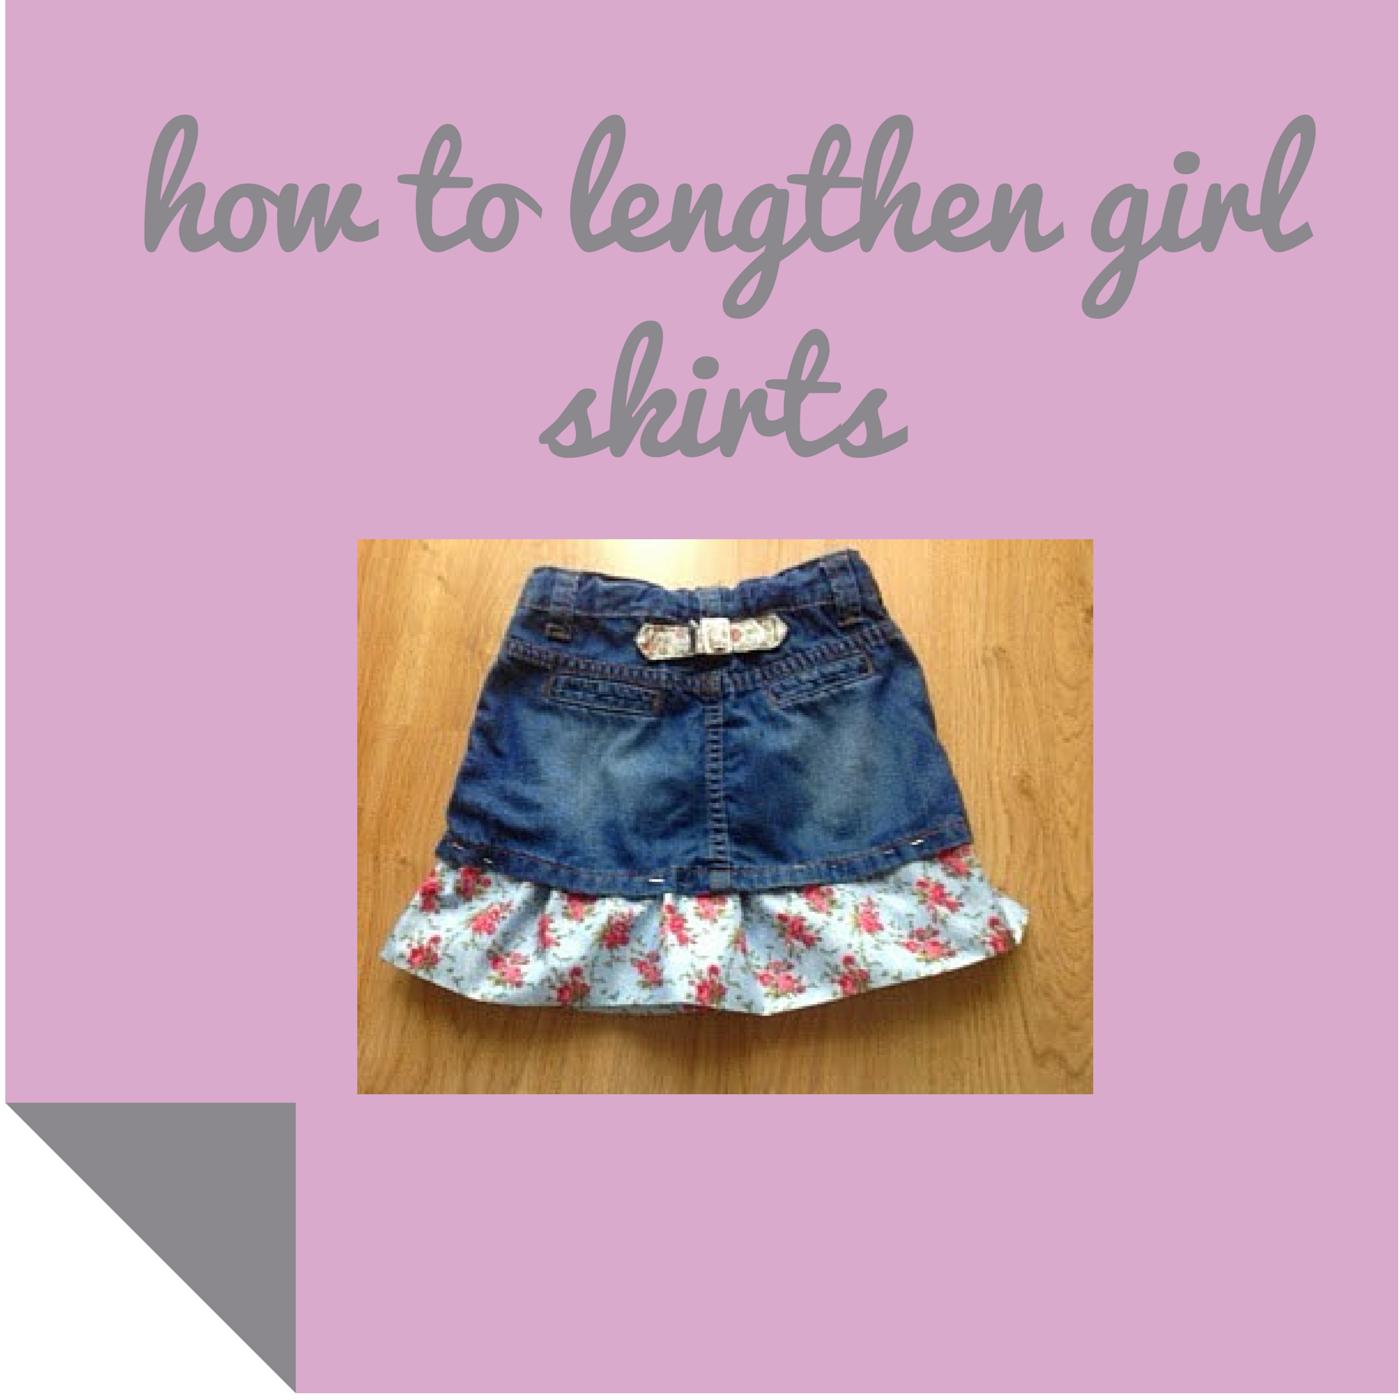 http://keepingitrreal.blogspot.com.es/2015/01/reuse-upcycle-how-to-lenghten-girls.html